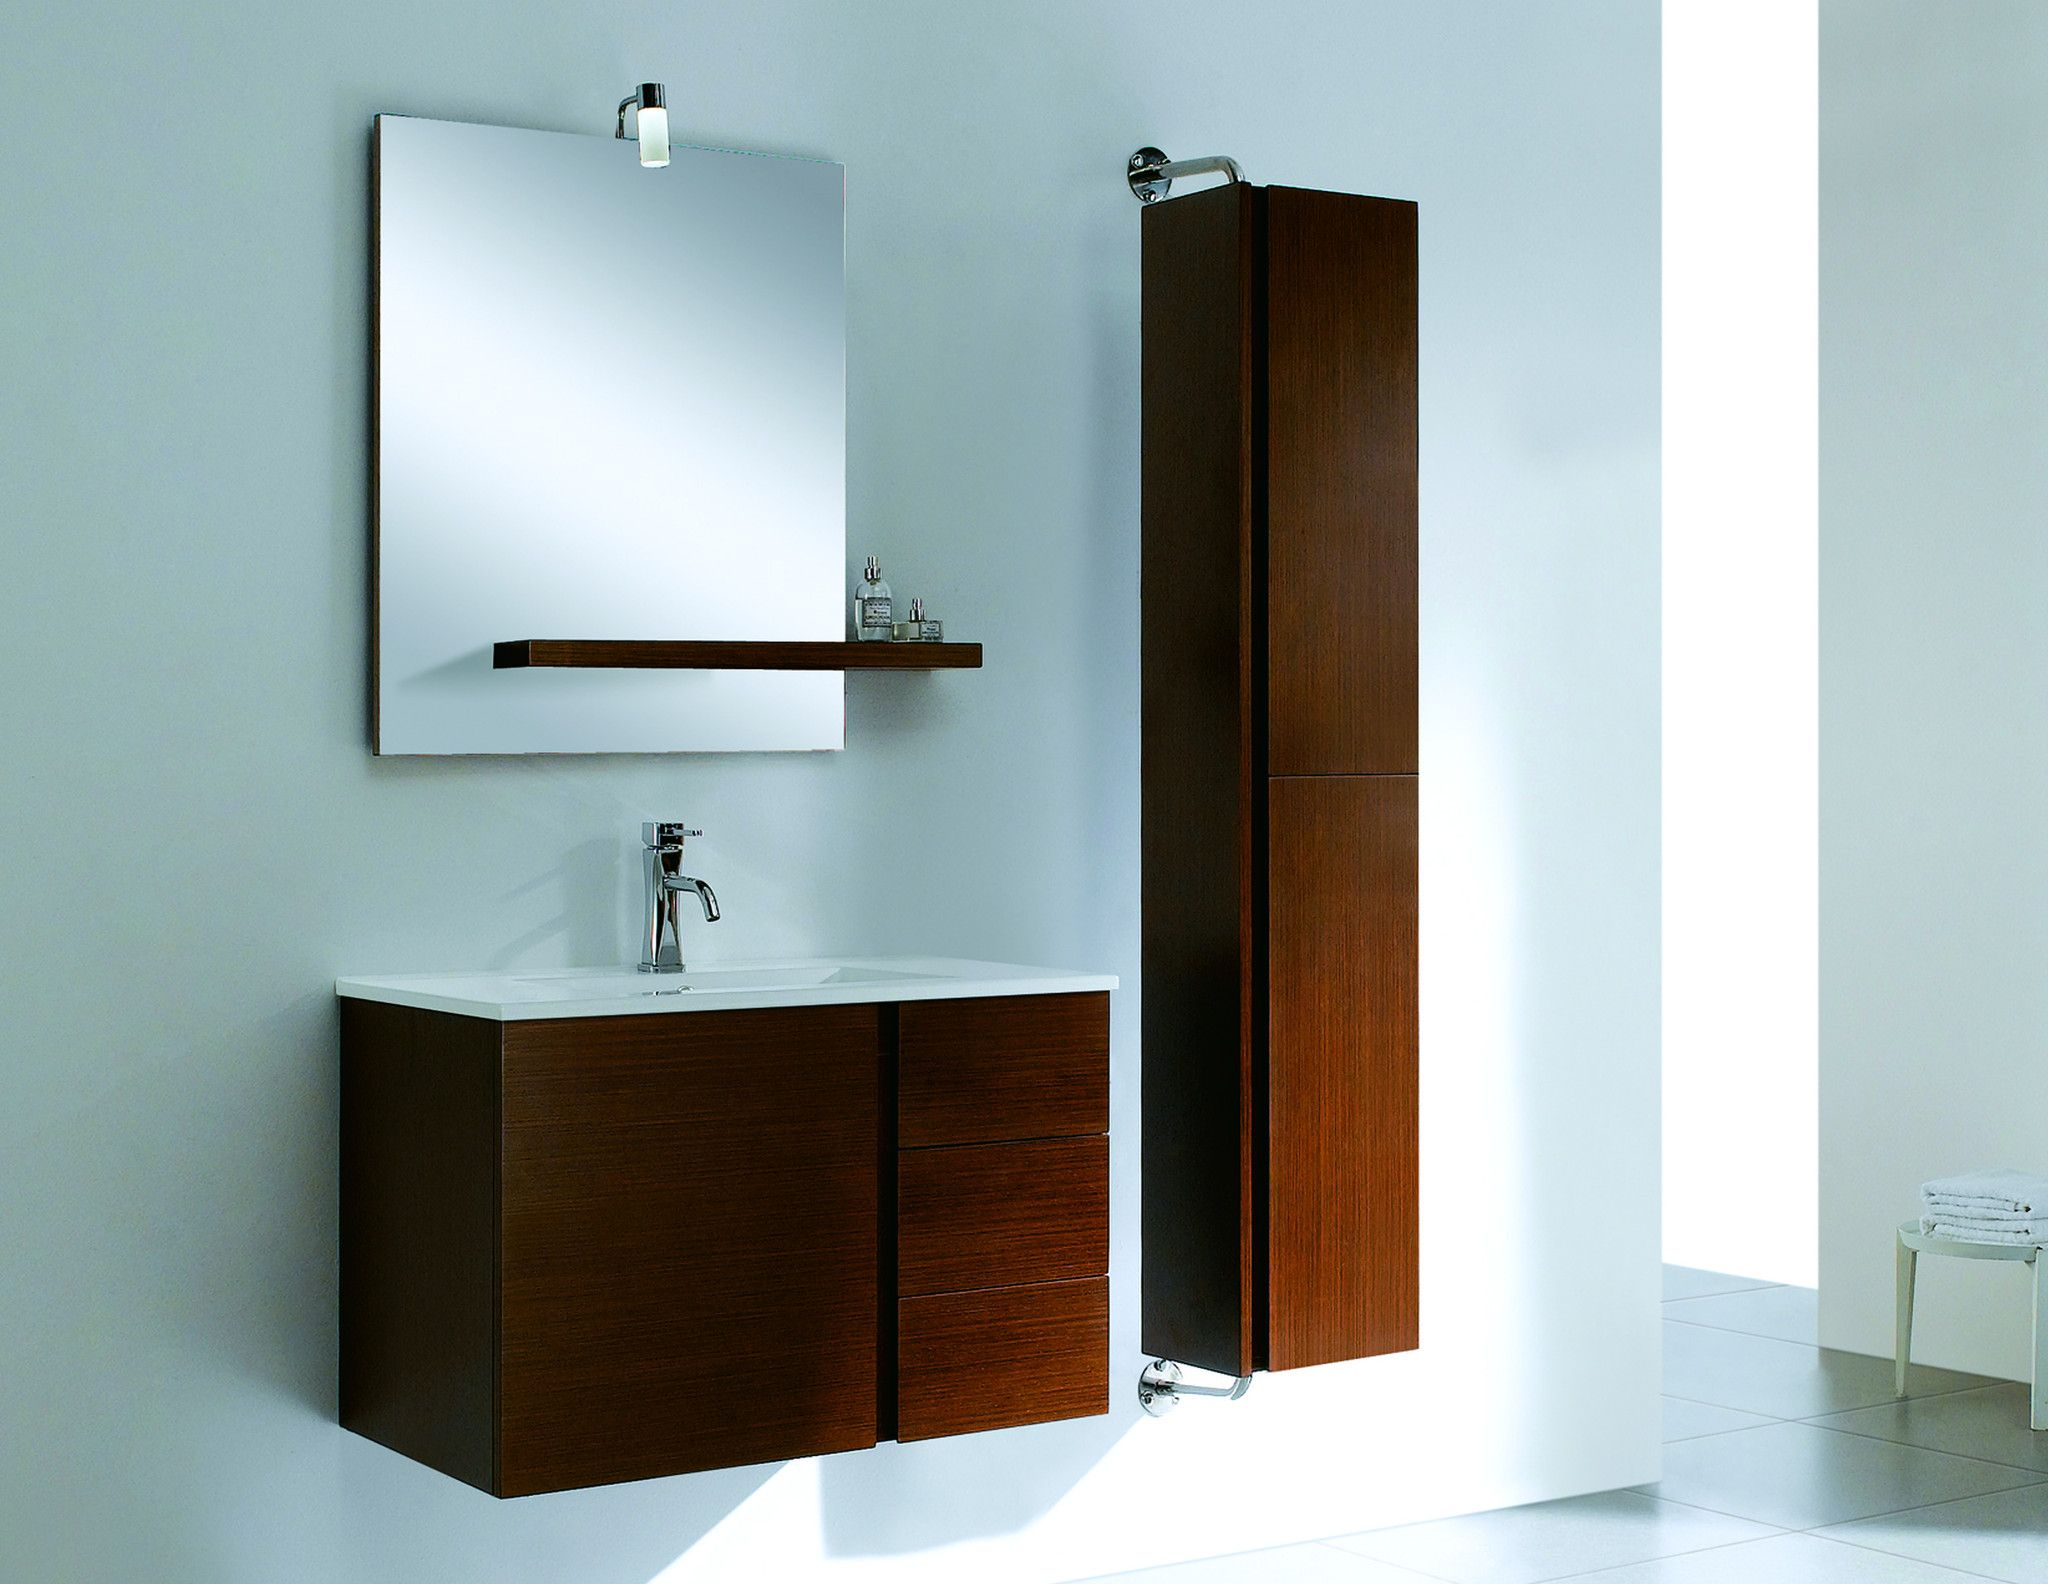 Caleb-32-wen-c | Vanities, Narrow bathroom vanities and Narrow bathroom